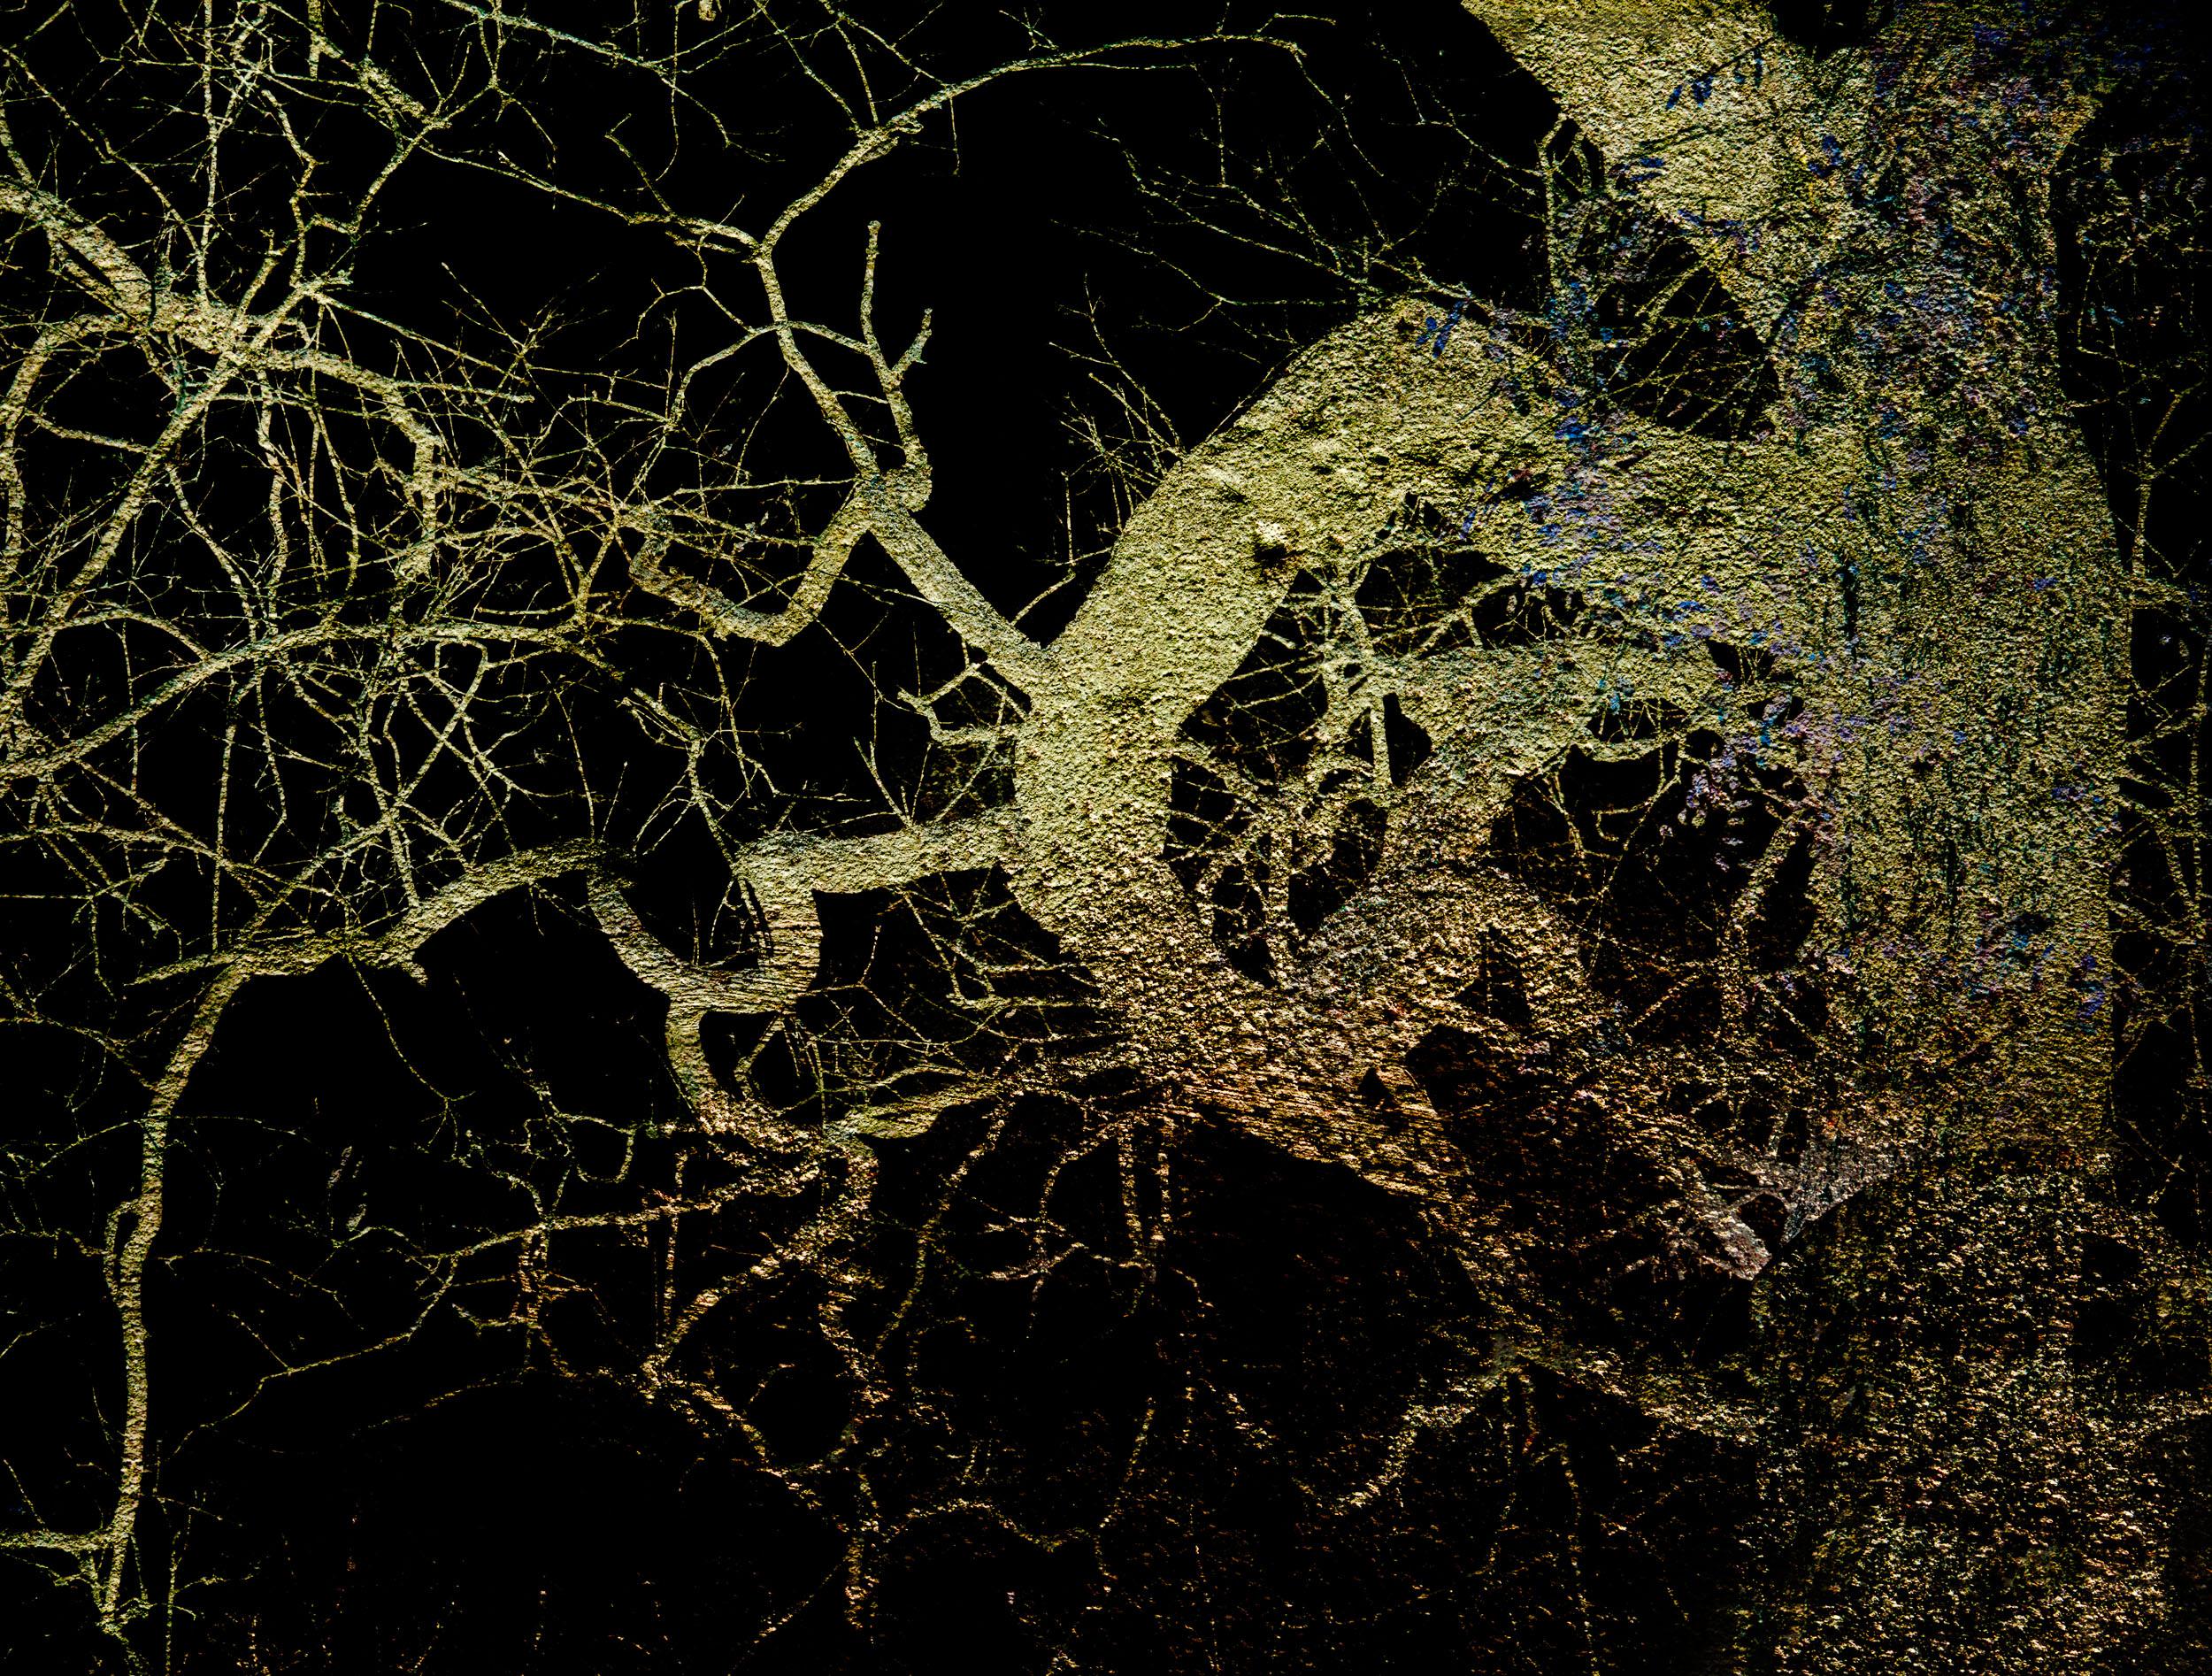 Ramas Torcidas IV / Twisted Branches IV